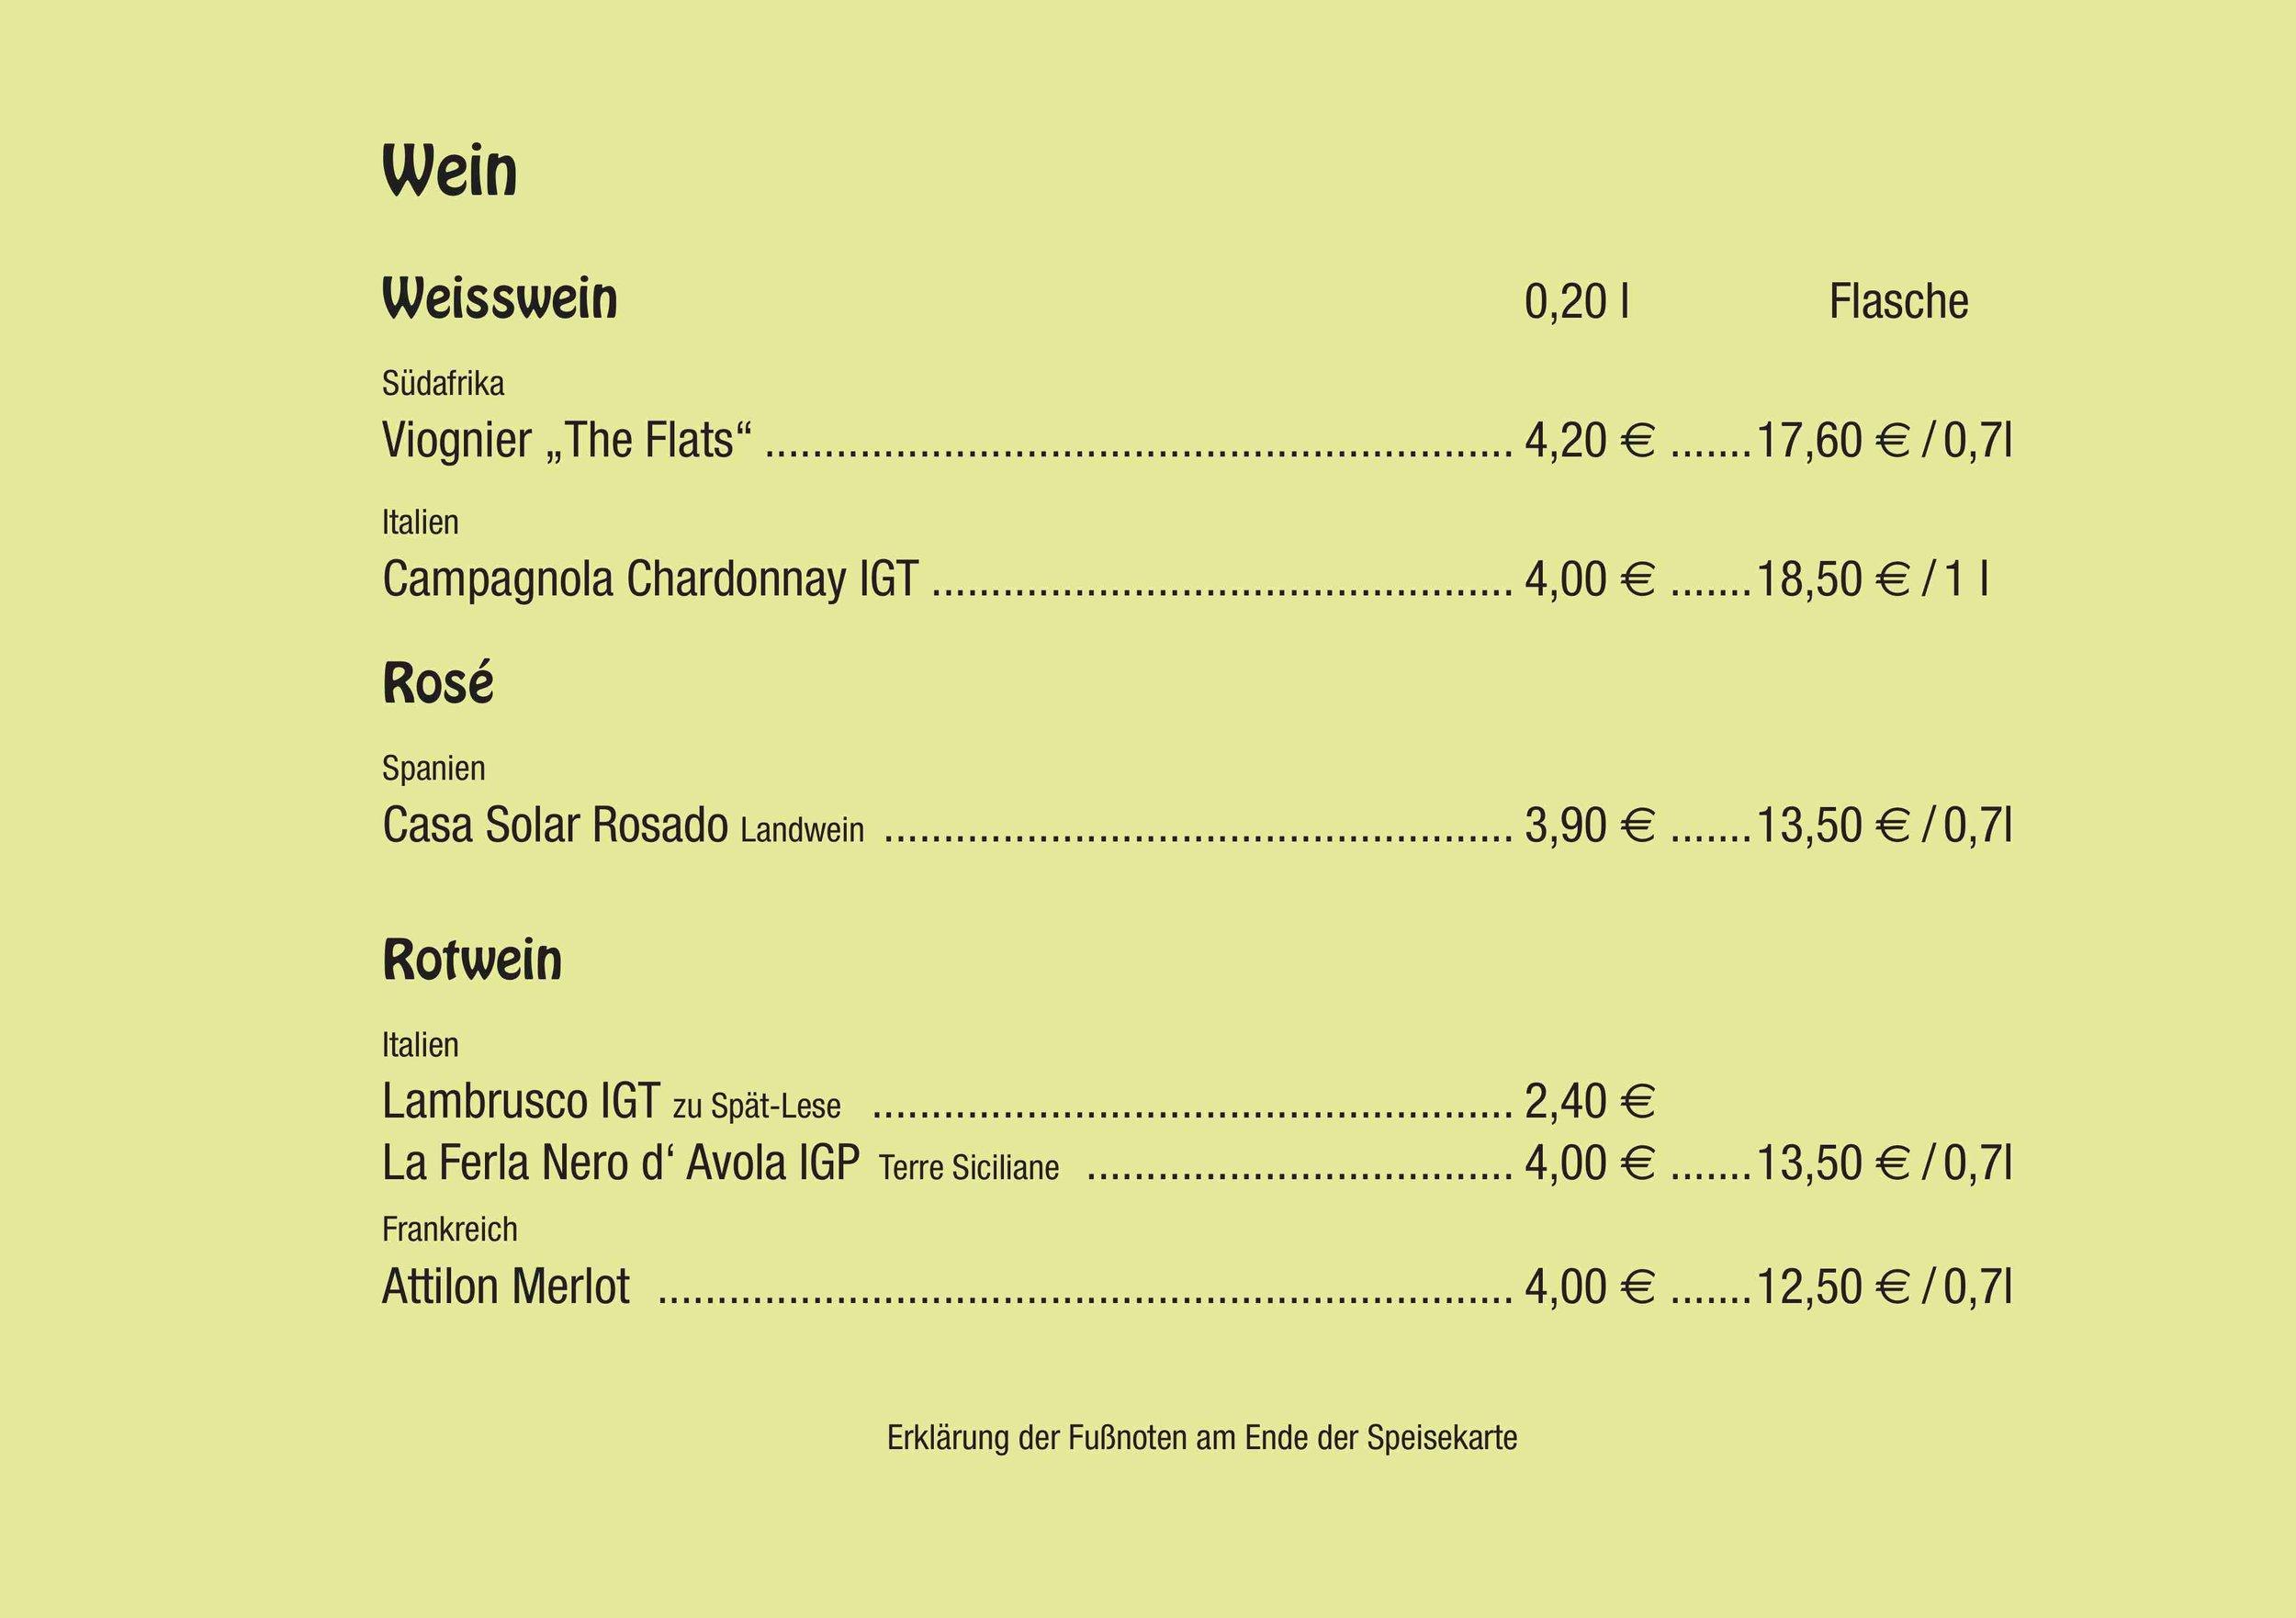 Kesselhaus_Bad_Tölz_Speisekarte_Wein.jpg